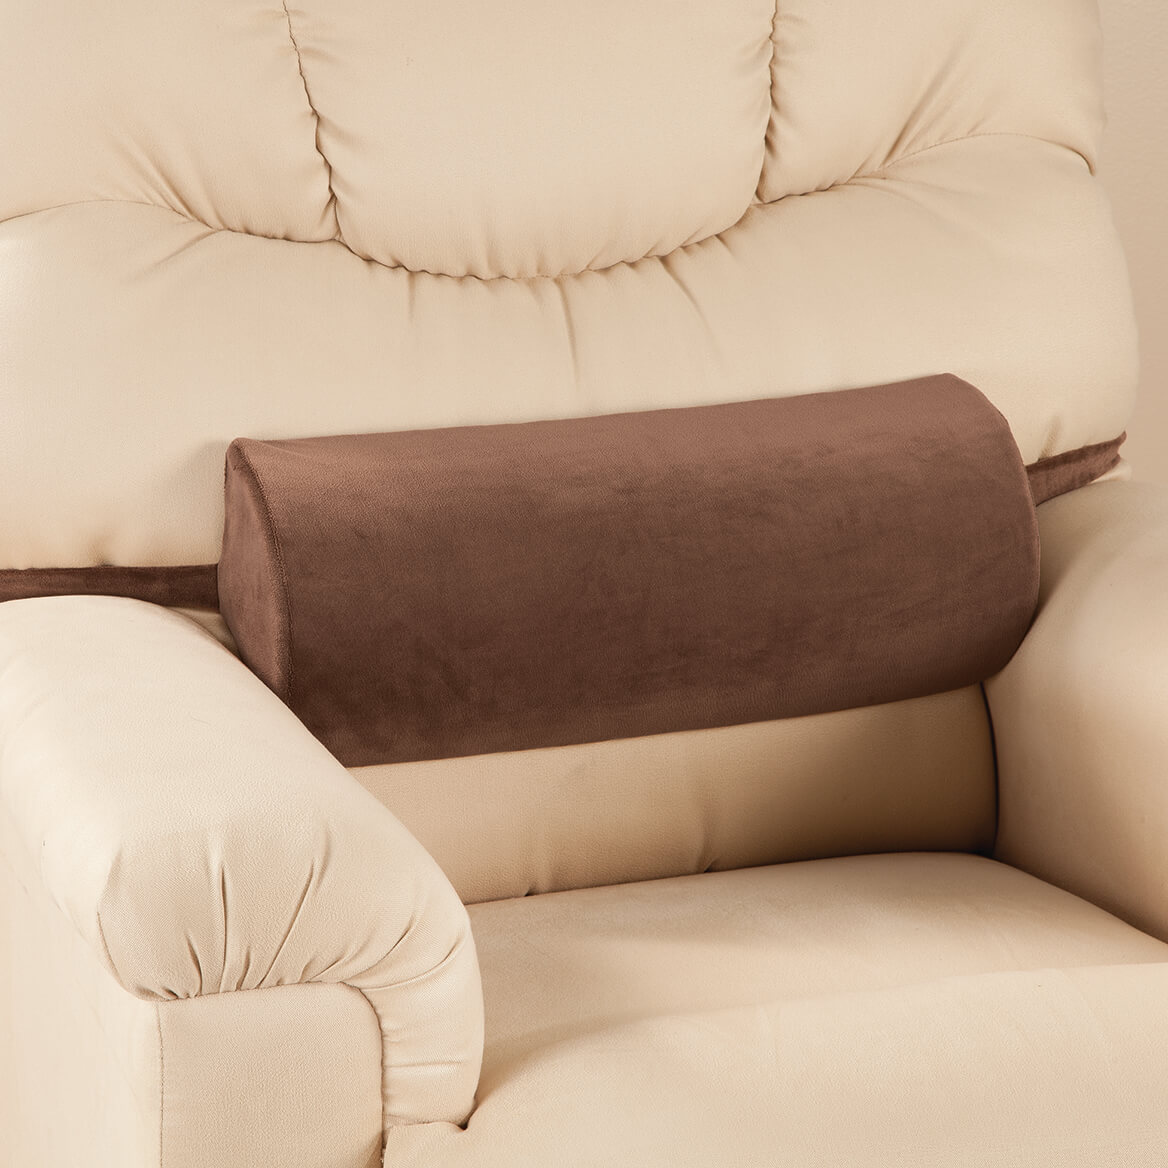 Seat Cushions - Wedge Pillows - Foam Cushions - Walter Drake